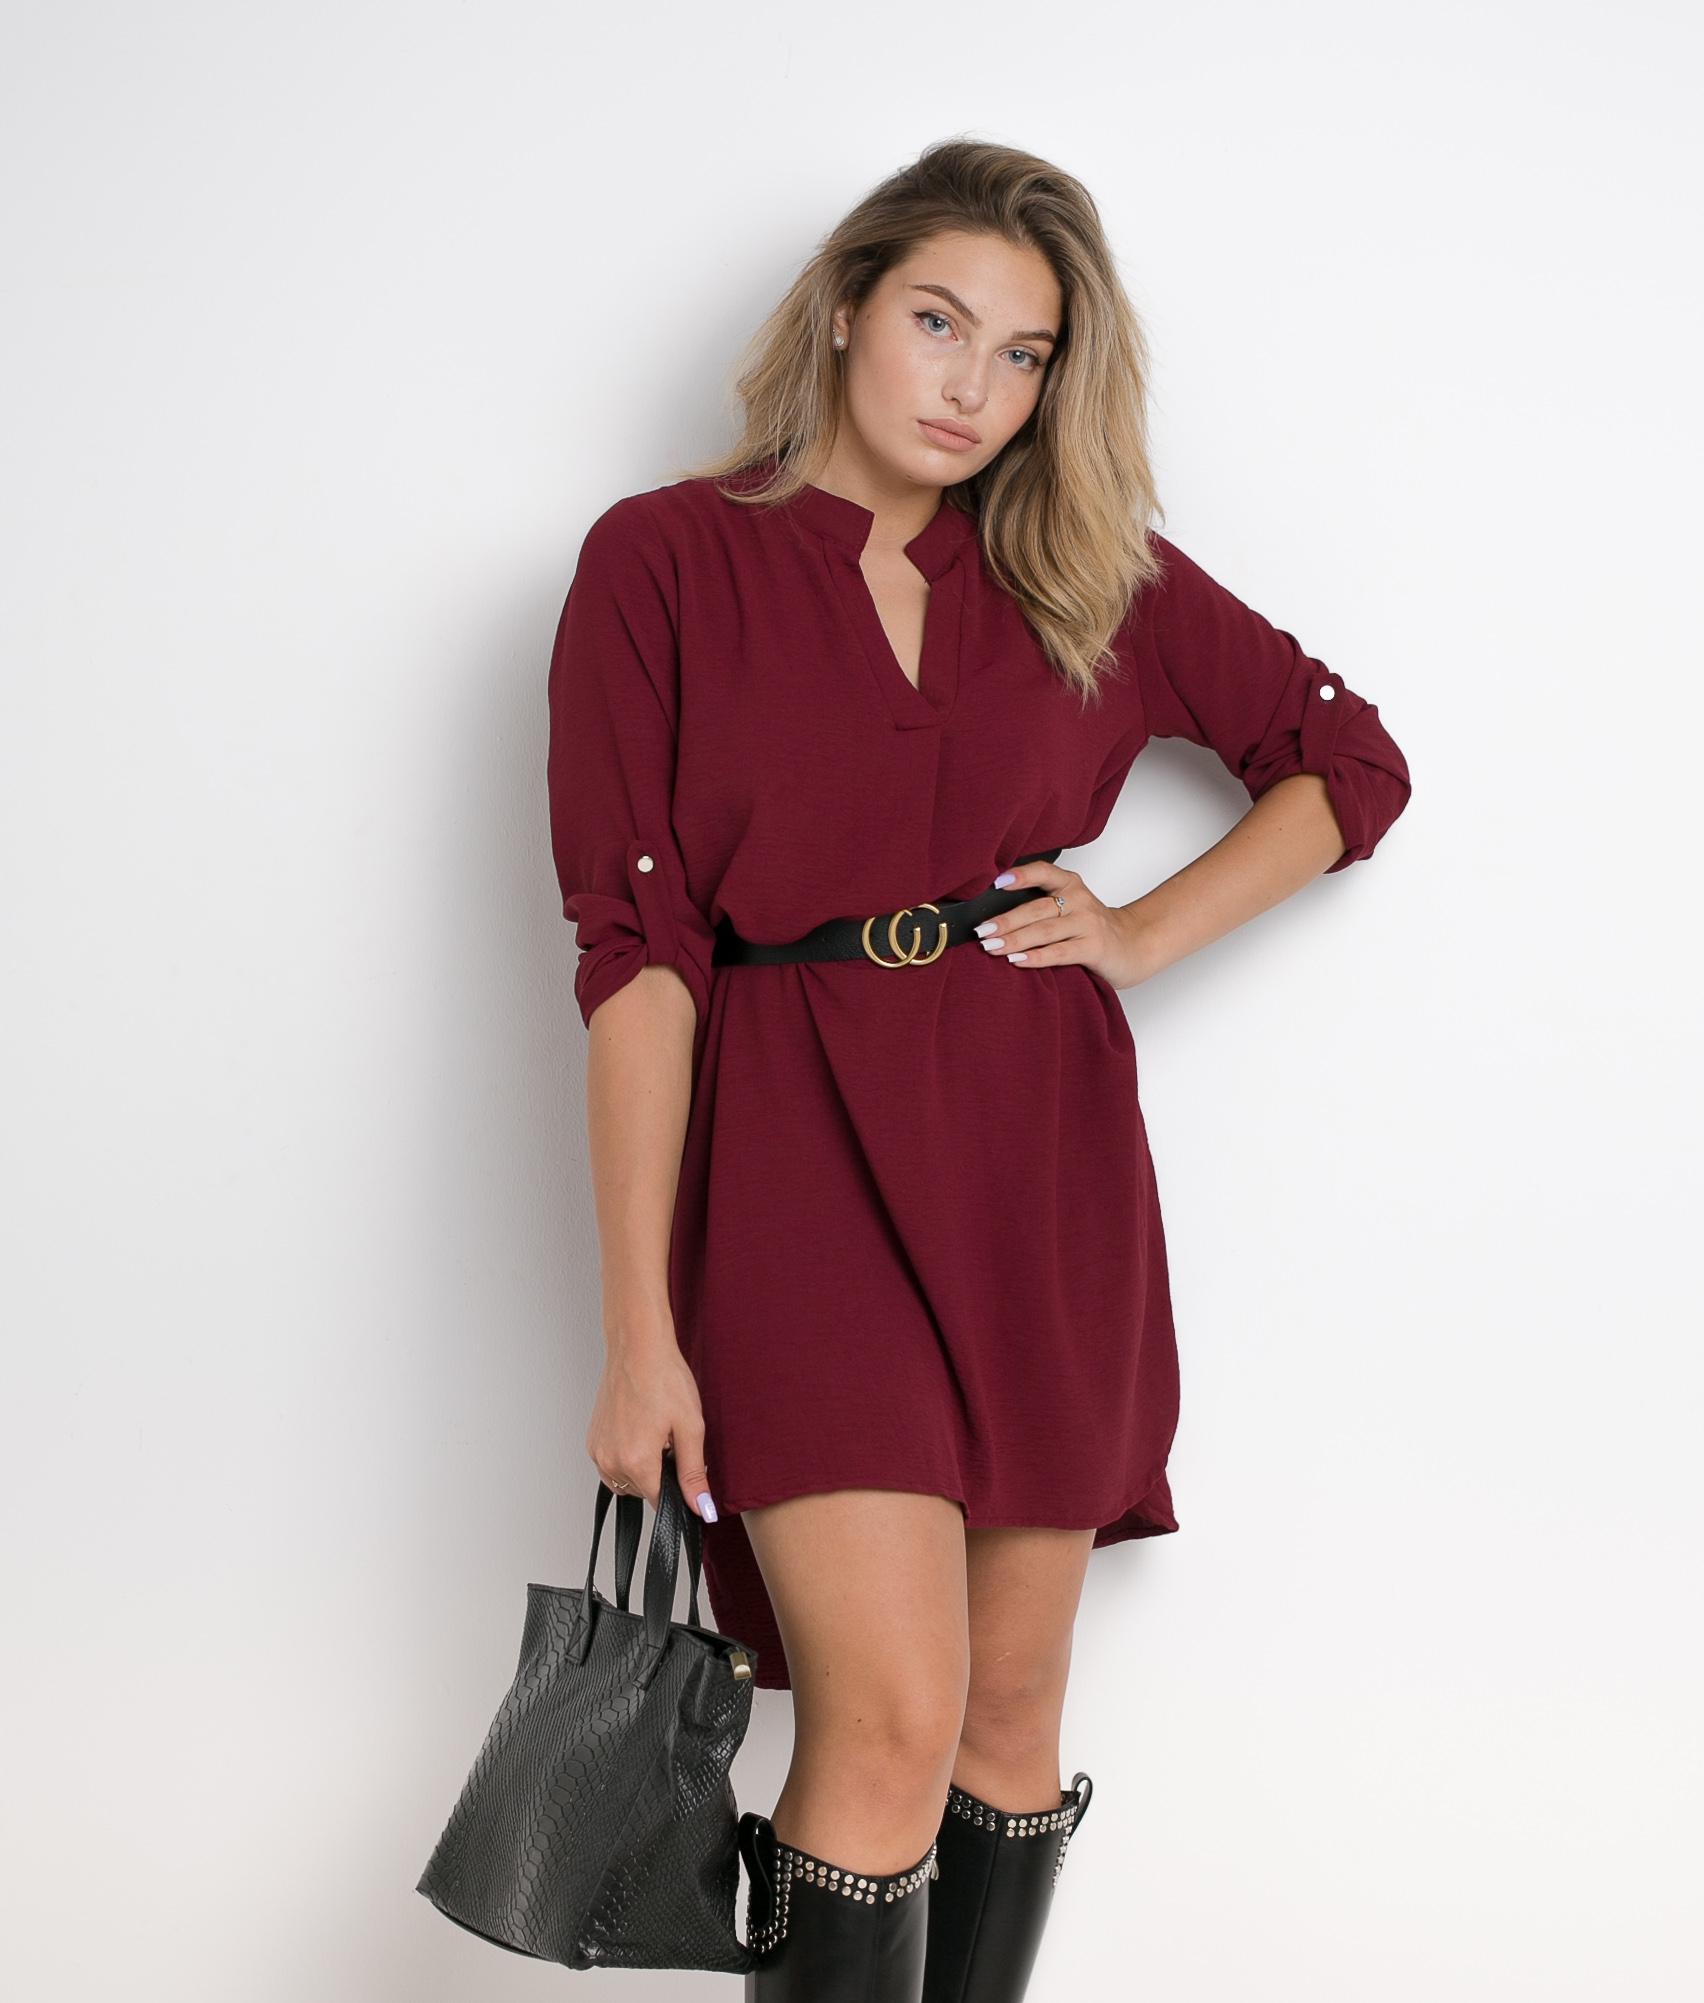 KURIA DRESS - MAROON